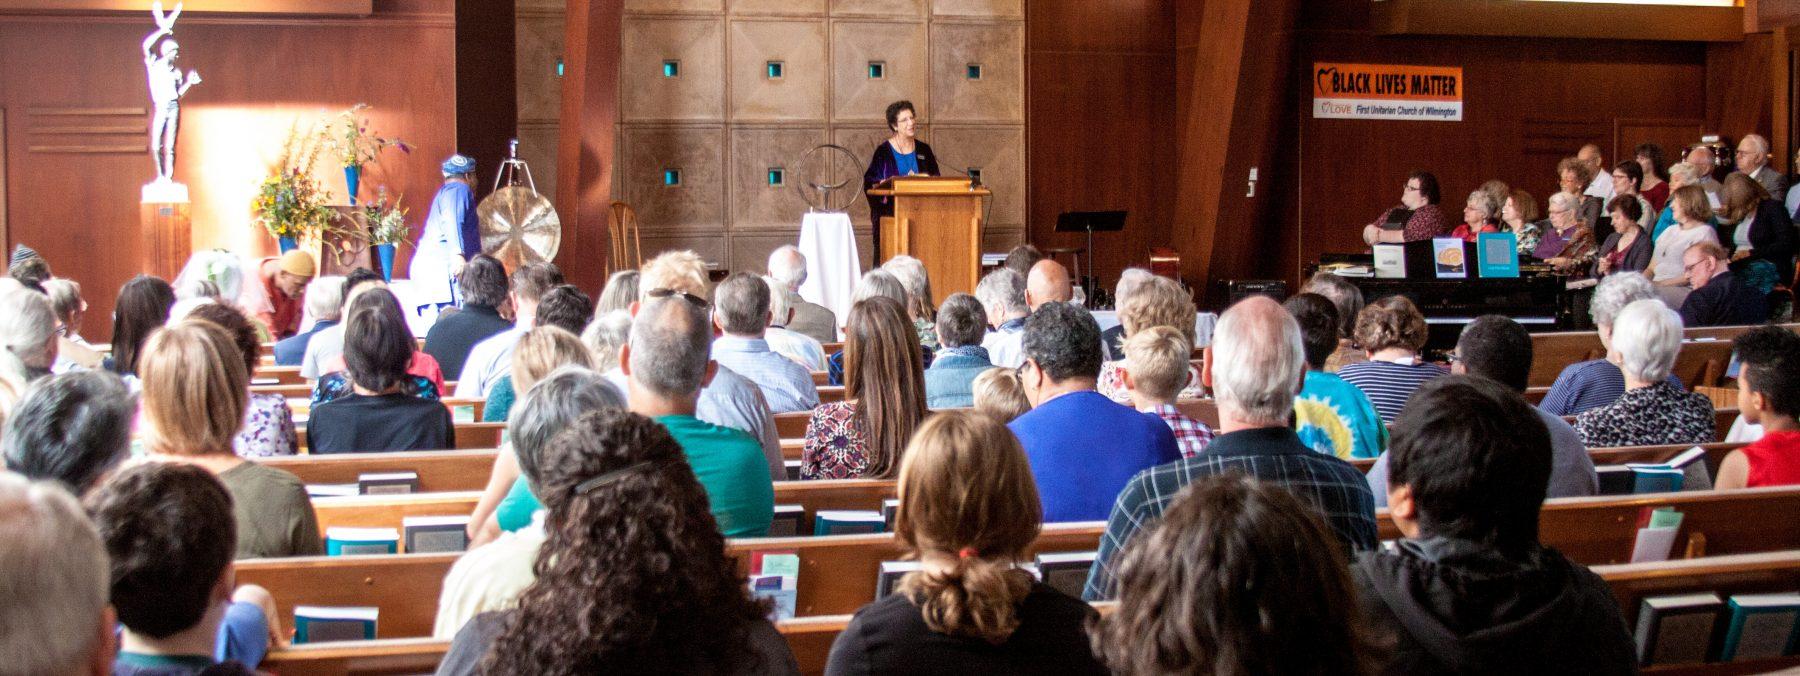 Sunday Worship Rev. Roberta Finkelstein